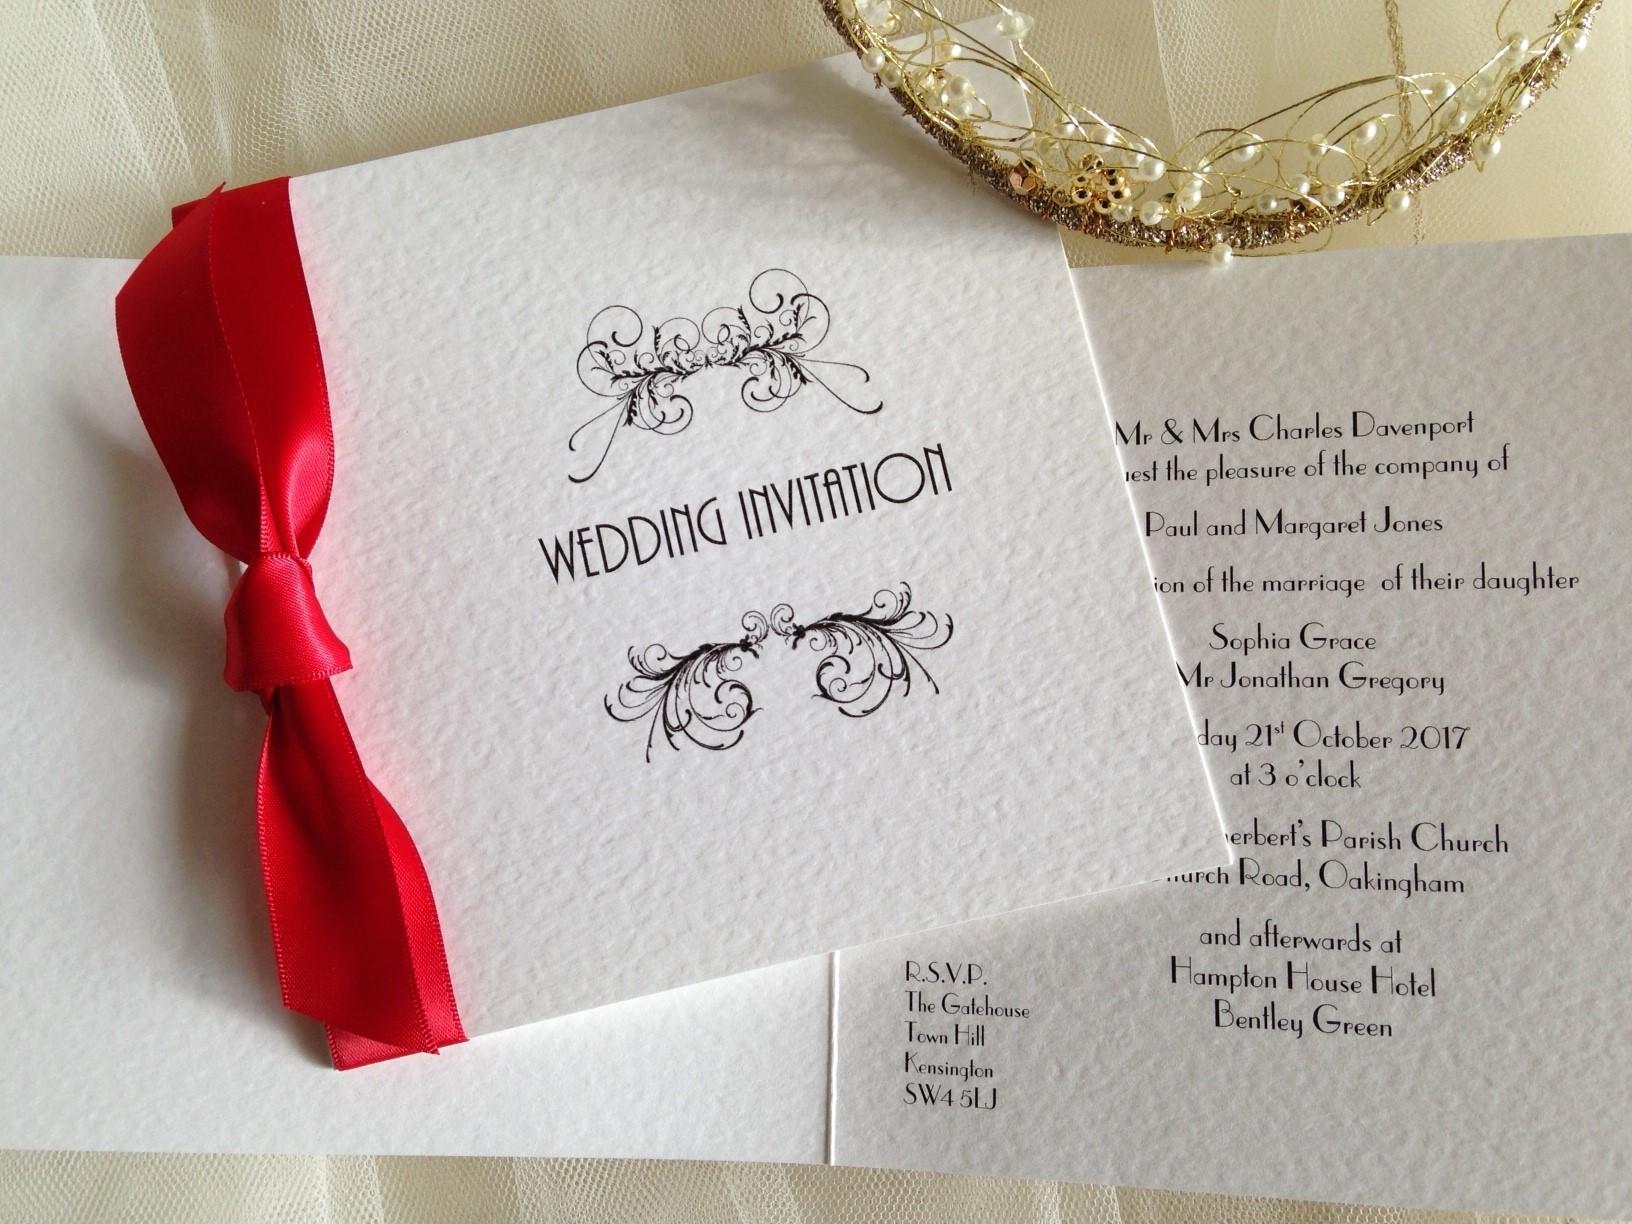 Red wedding invitations - Daisy Chain Invites